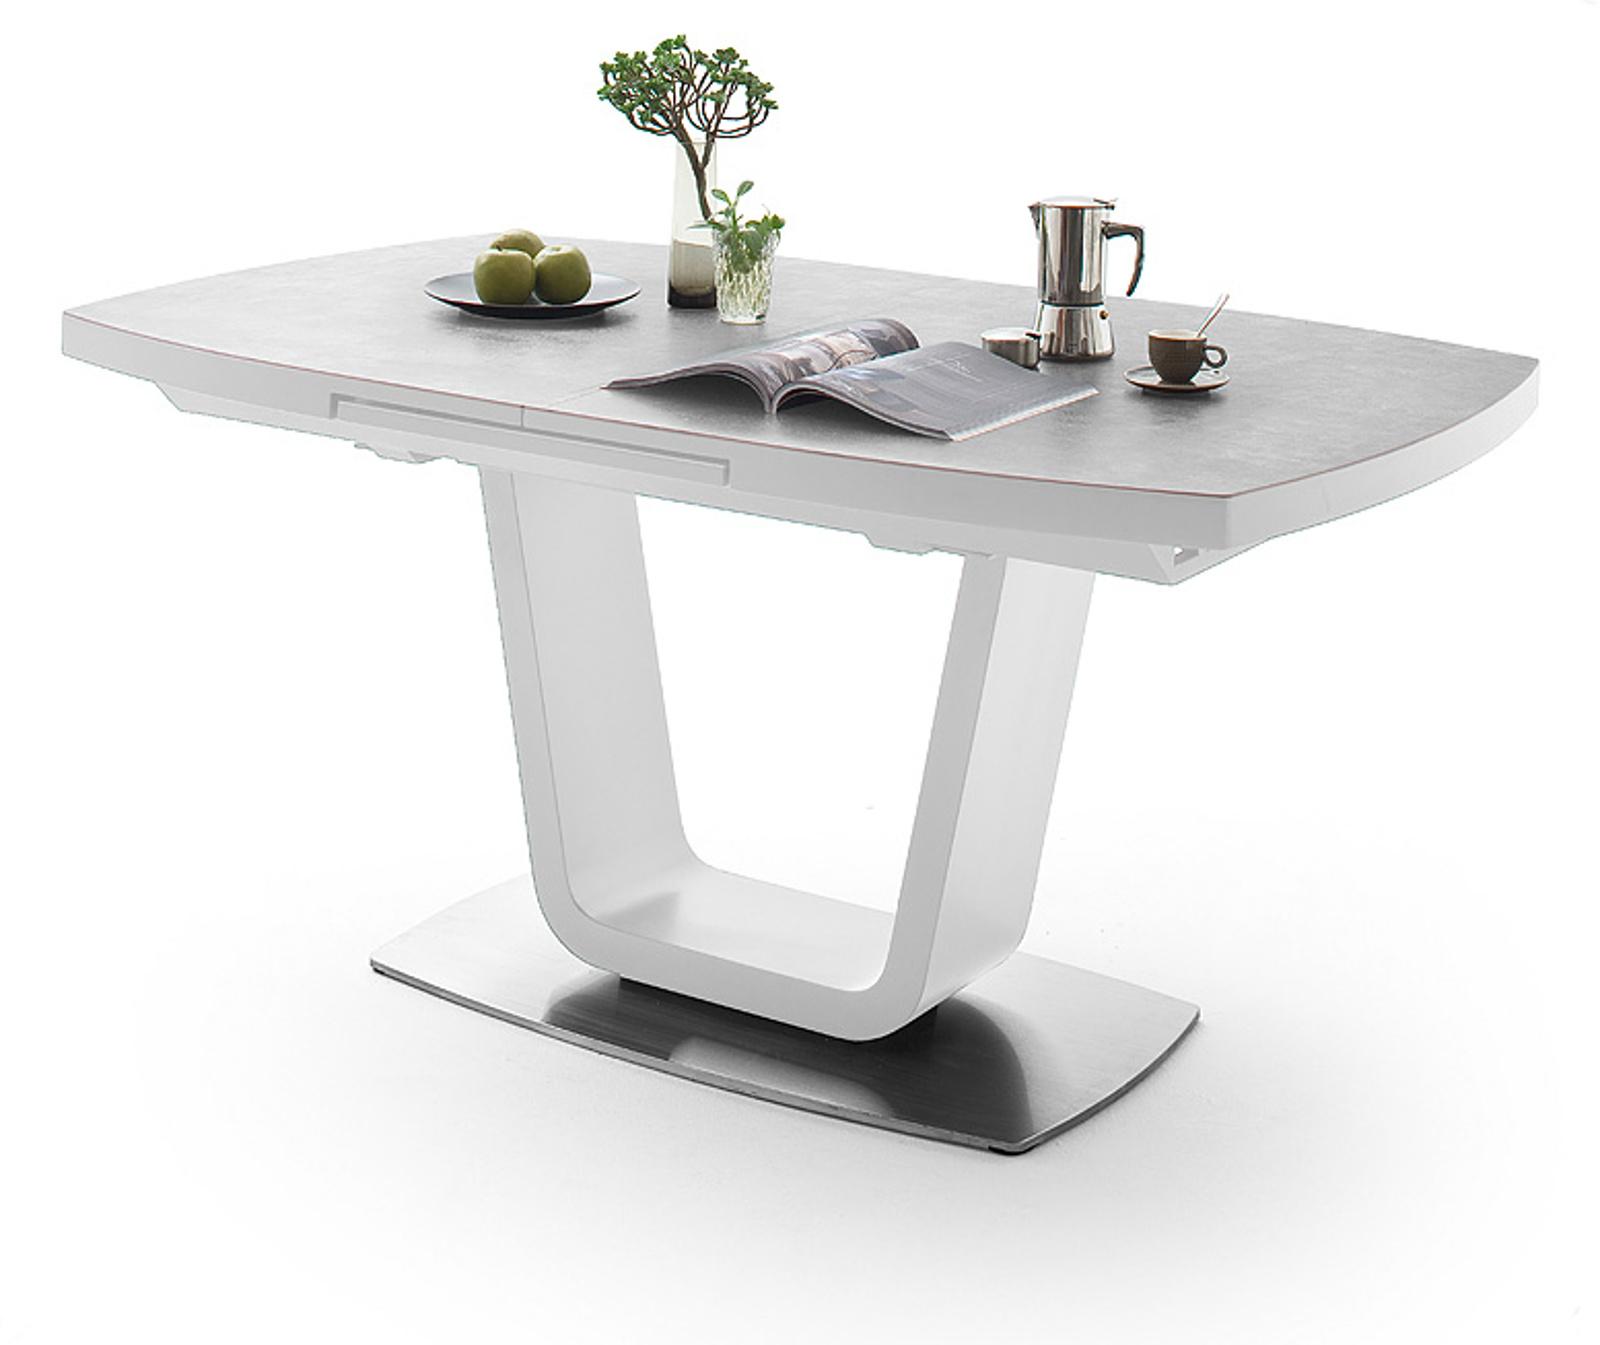 esstisch leandro wei lack keramik grau 180 cm. Black Bedroom Furniture Sets. Home Design Ideas